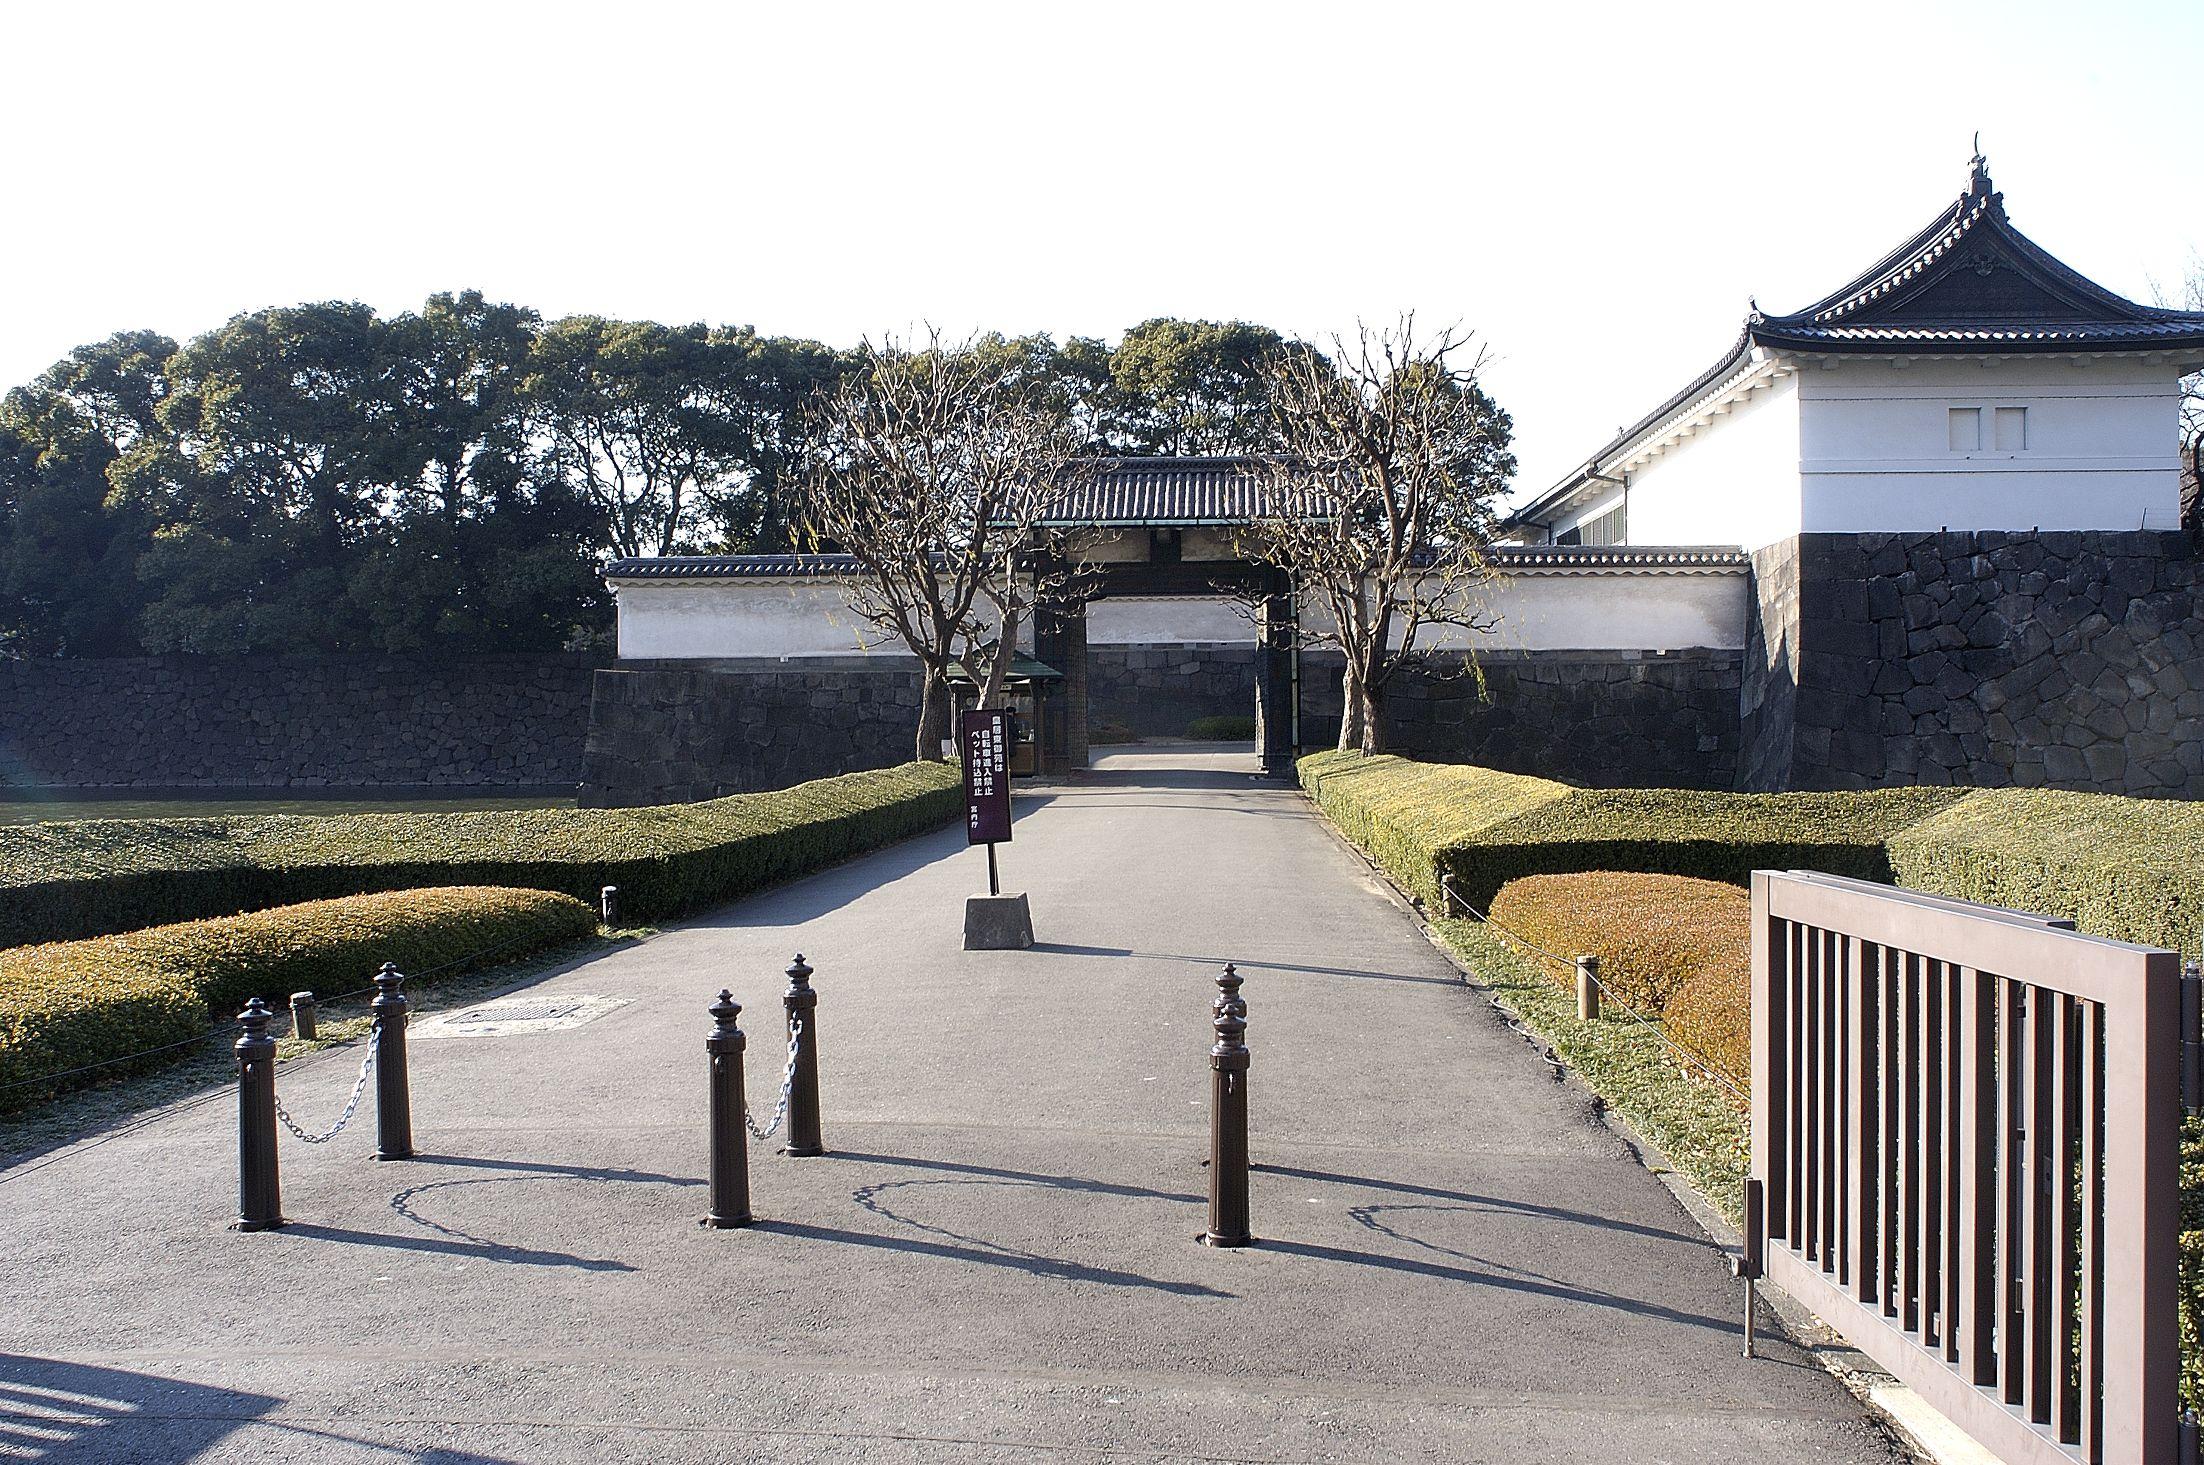 Ote-mon Gate bridge